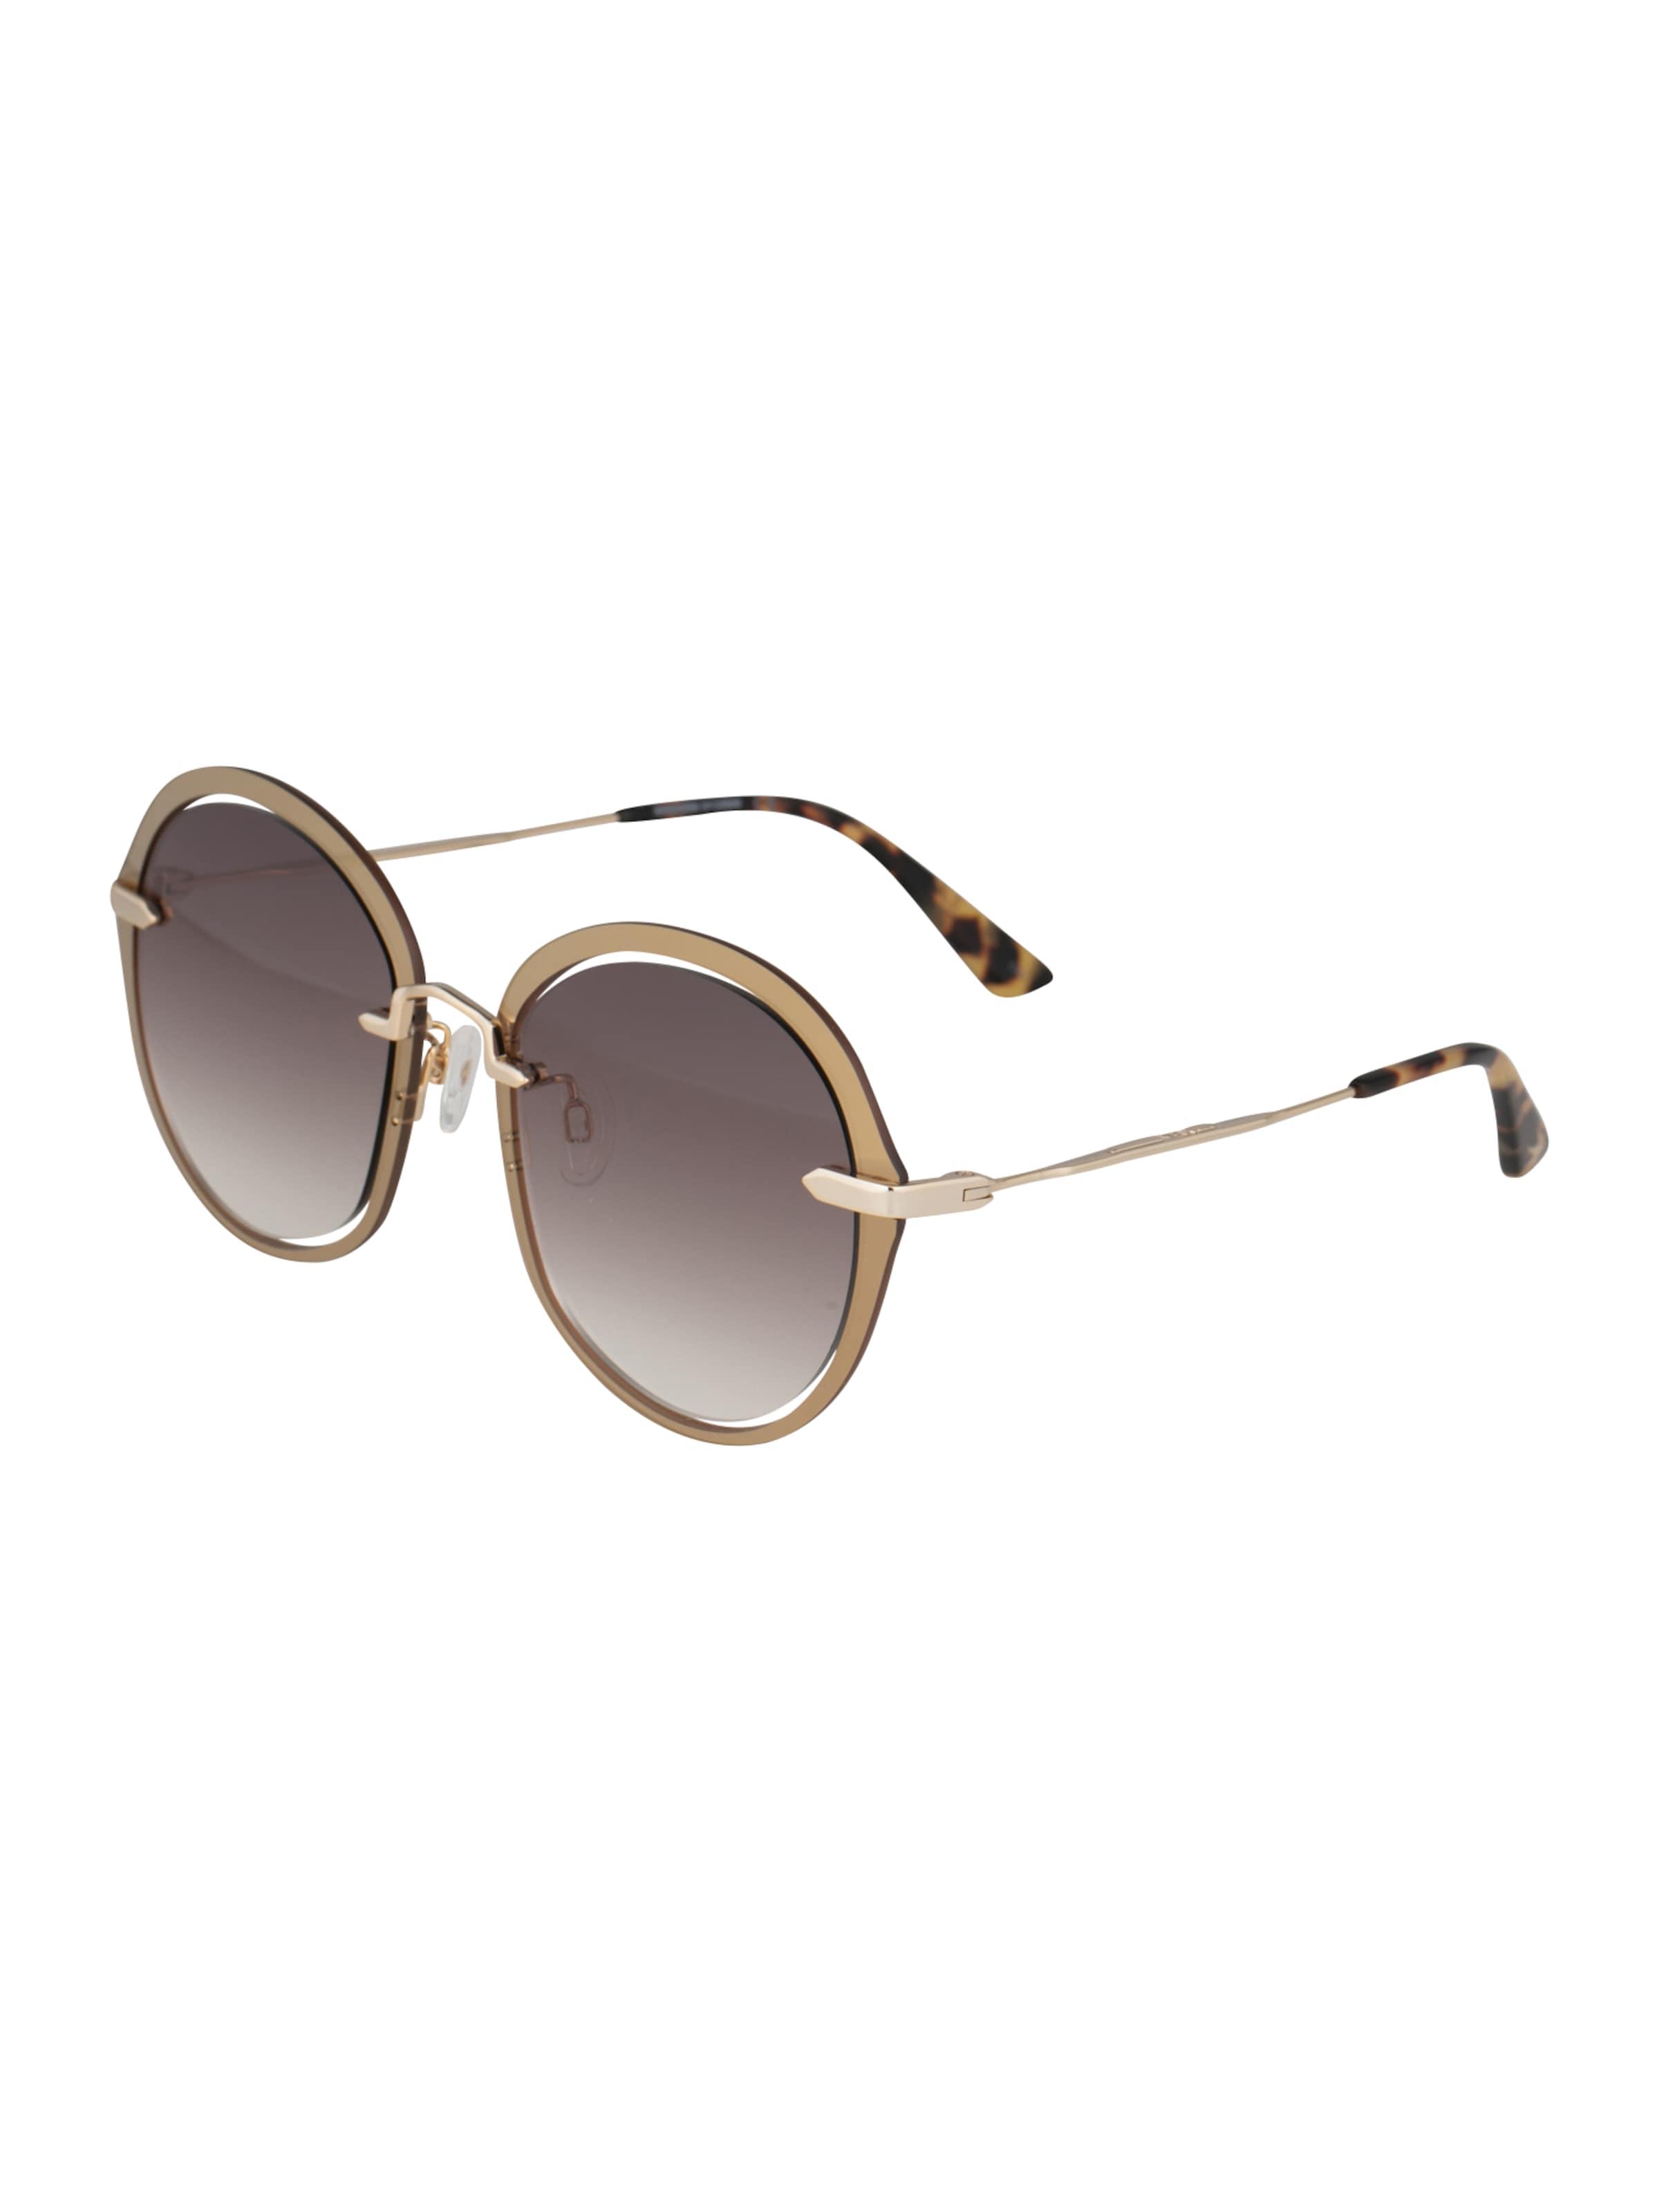 McQ Alexander McQueen Solglasögon i brun / guld